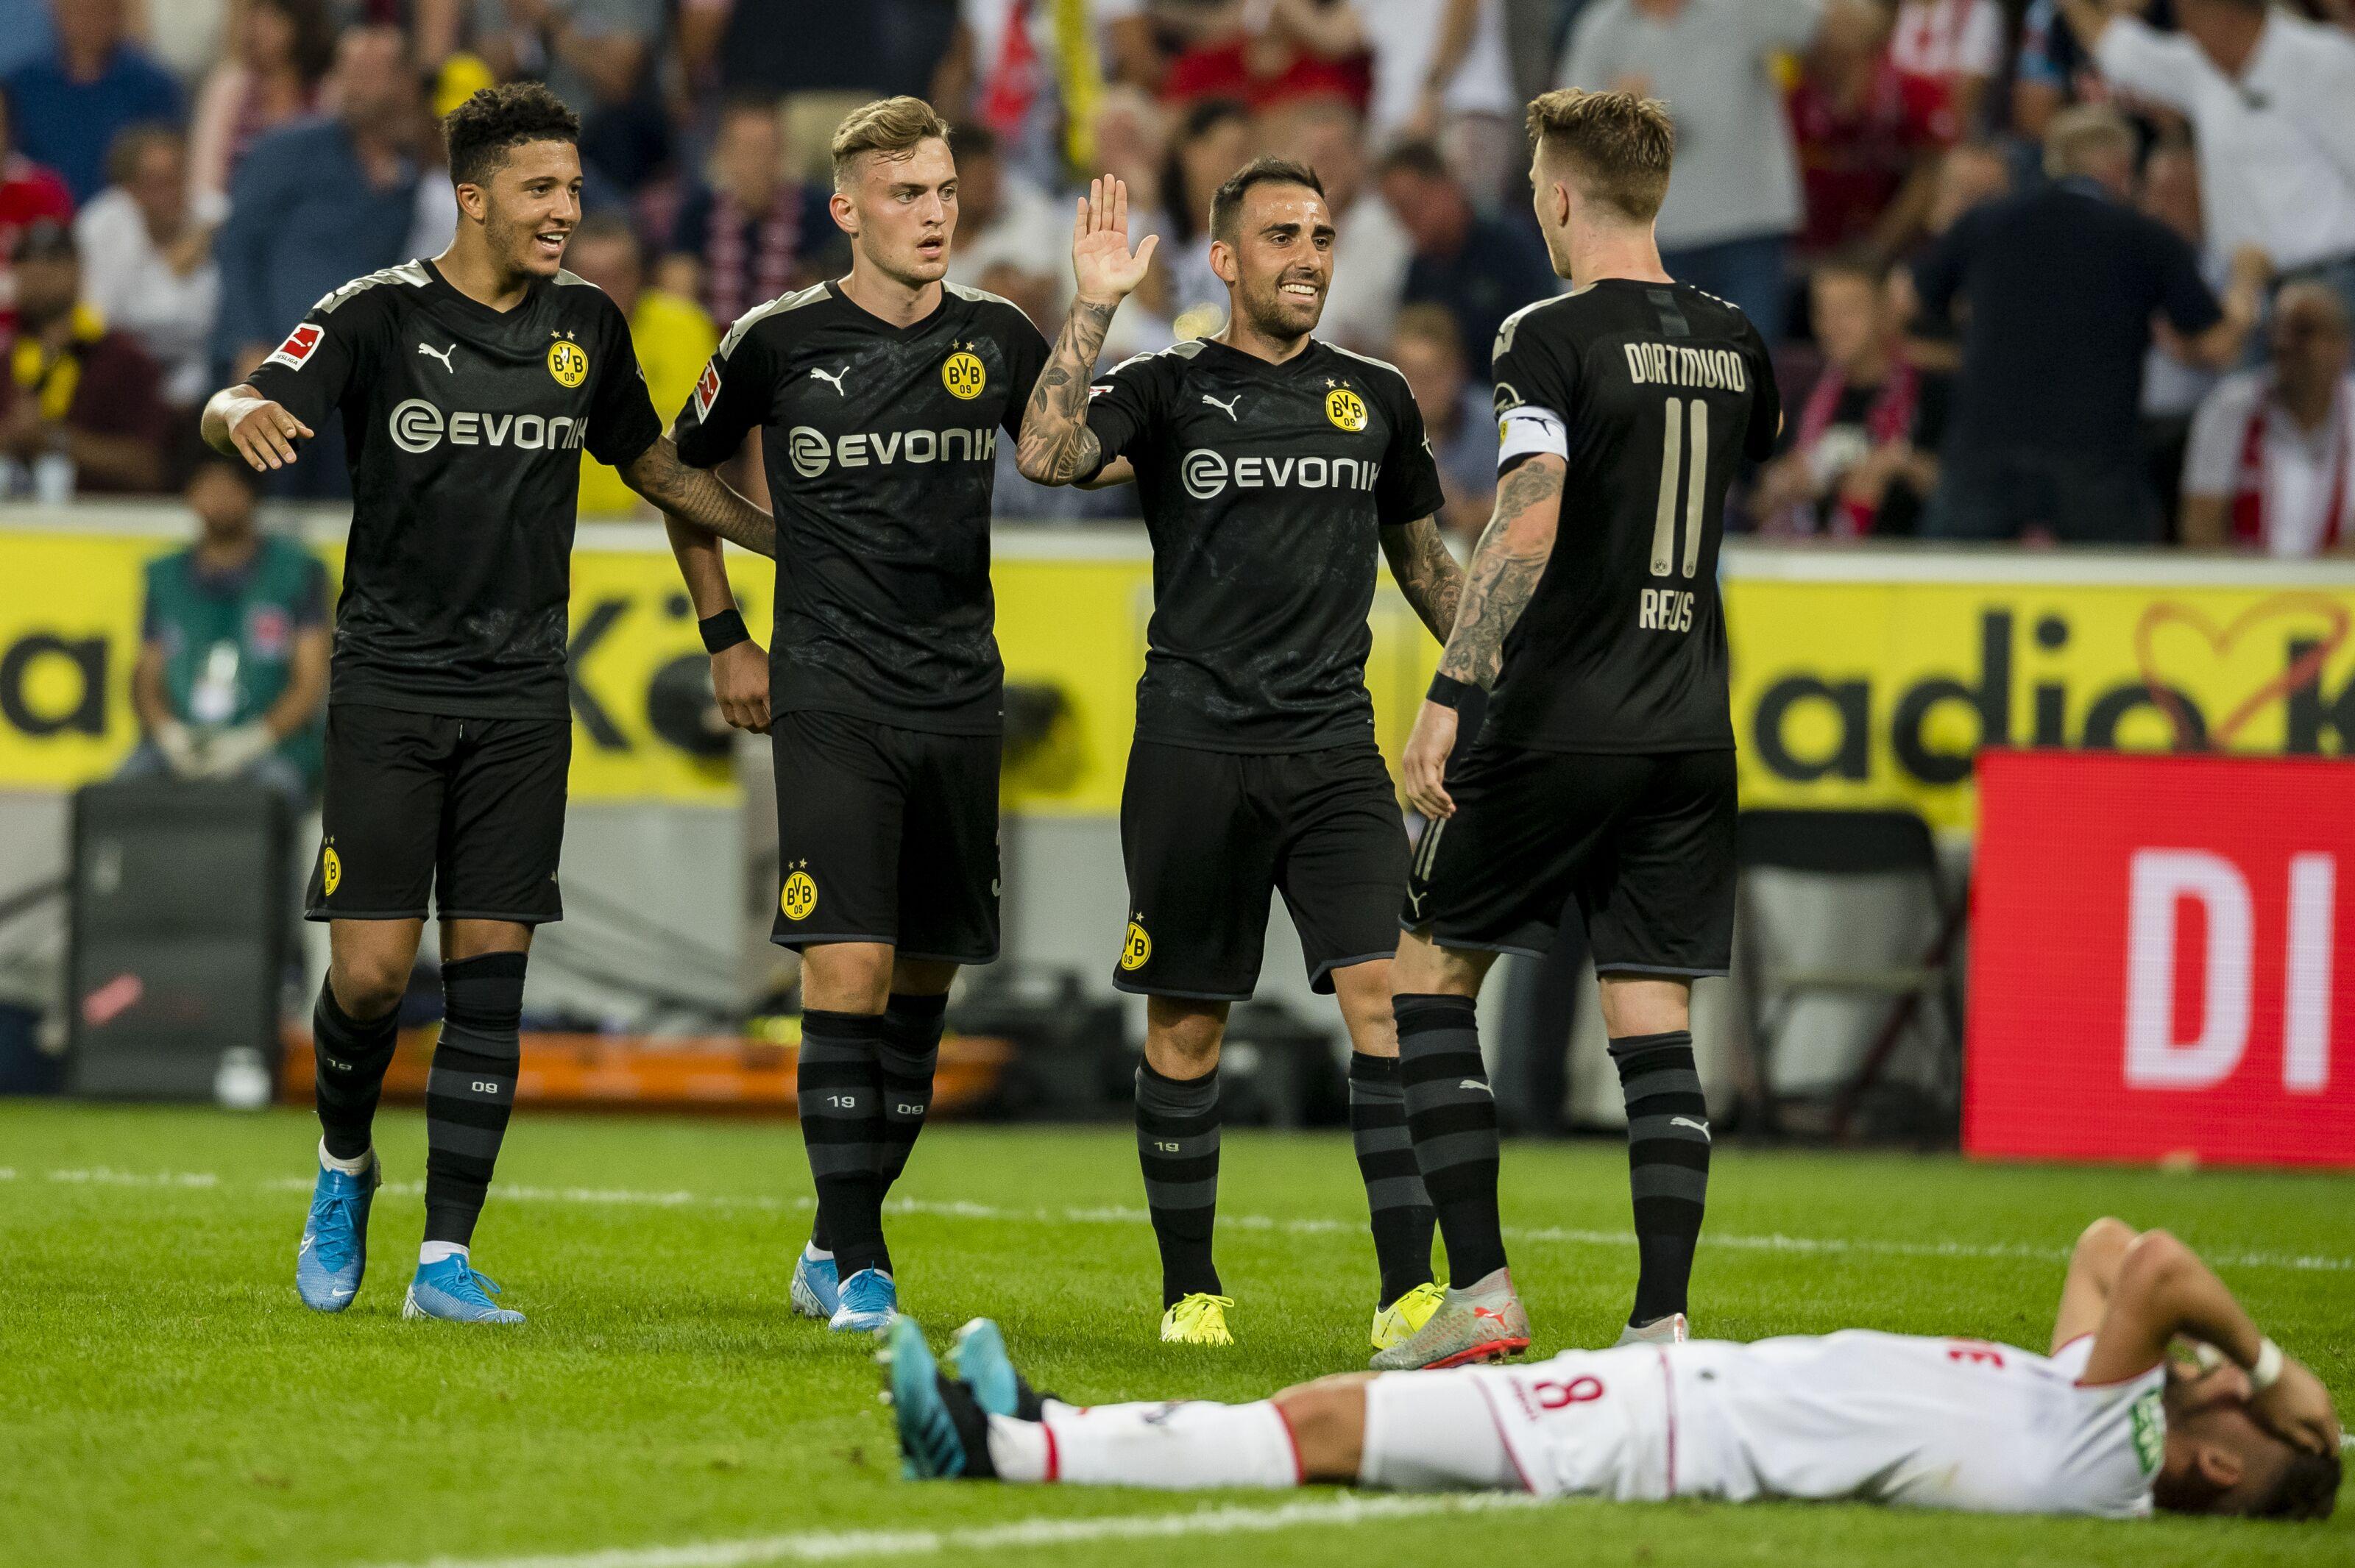 Bundesliga Roundup: Borussia Dortmund continue winning run, Bayern thrash Schalke